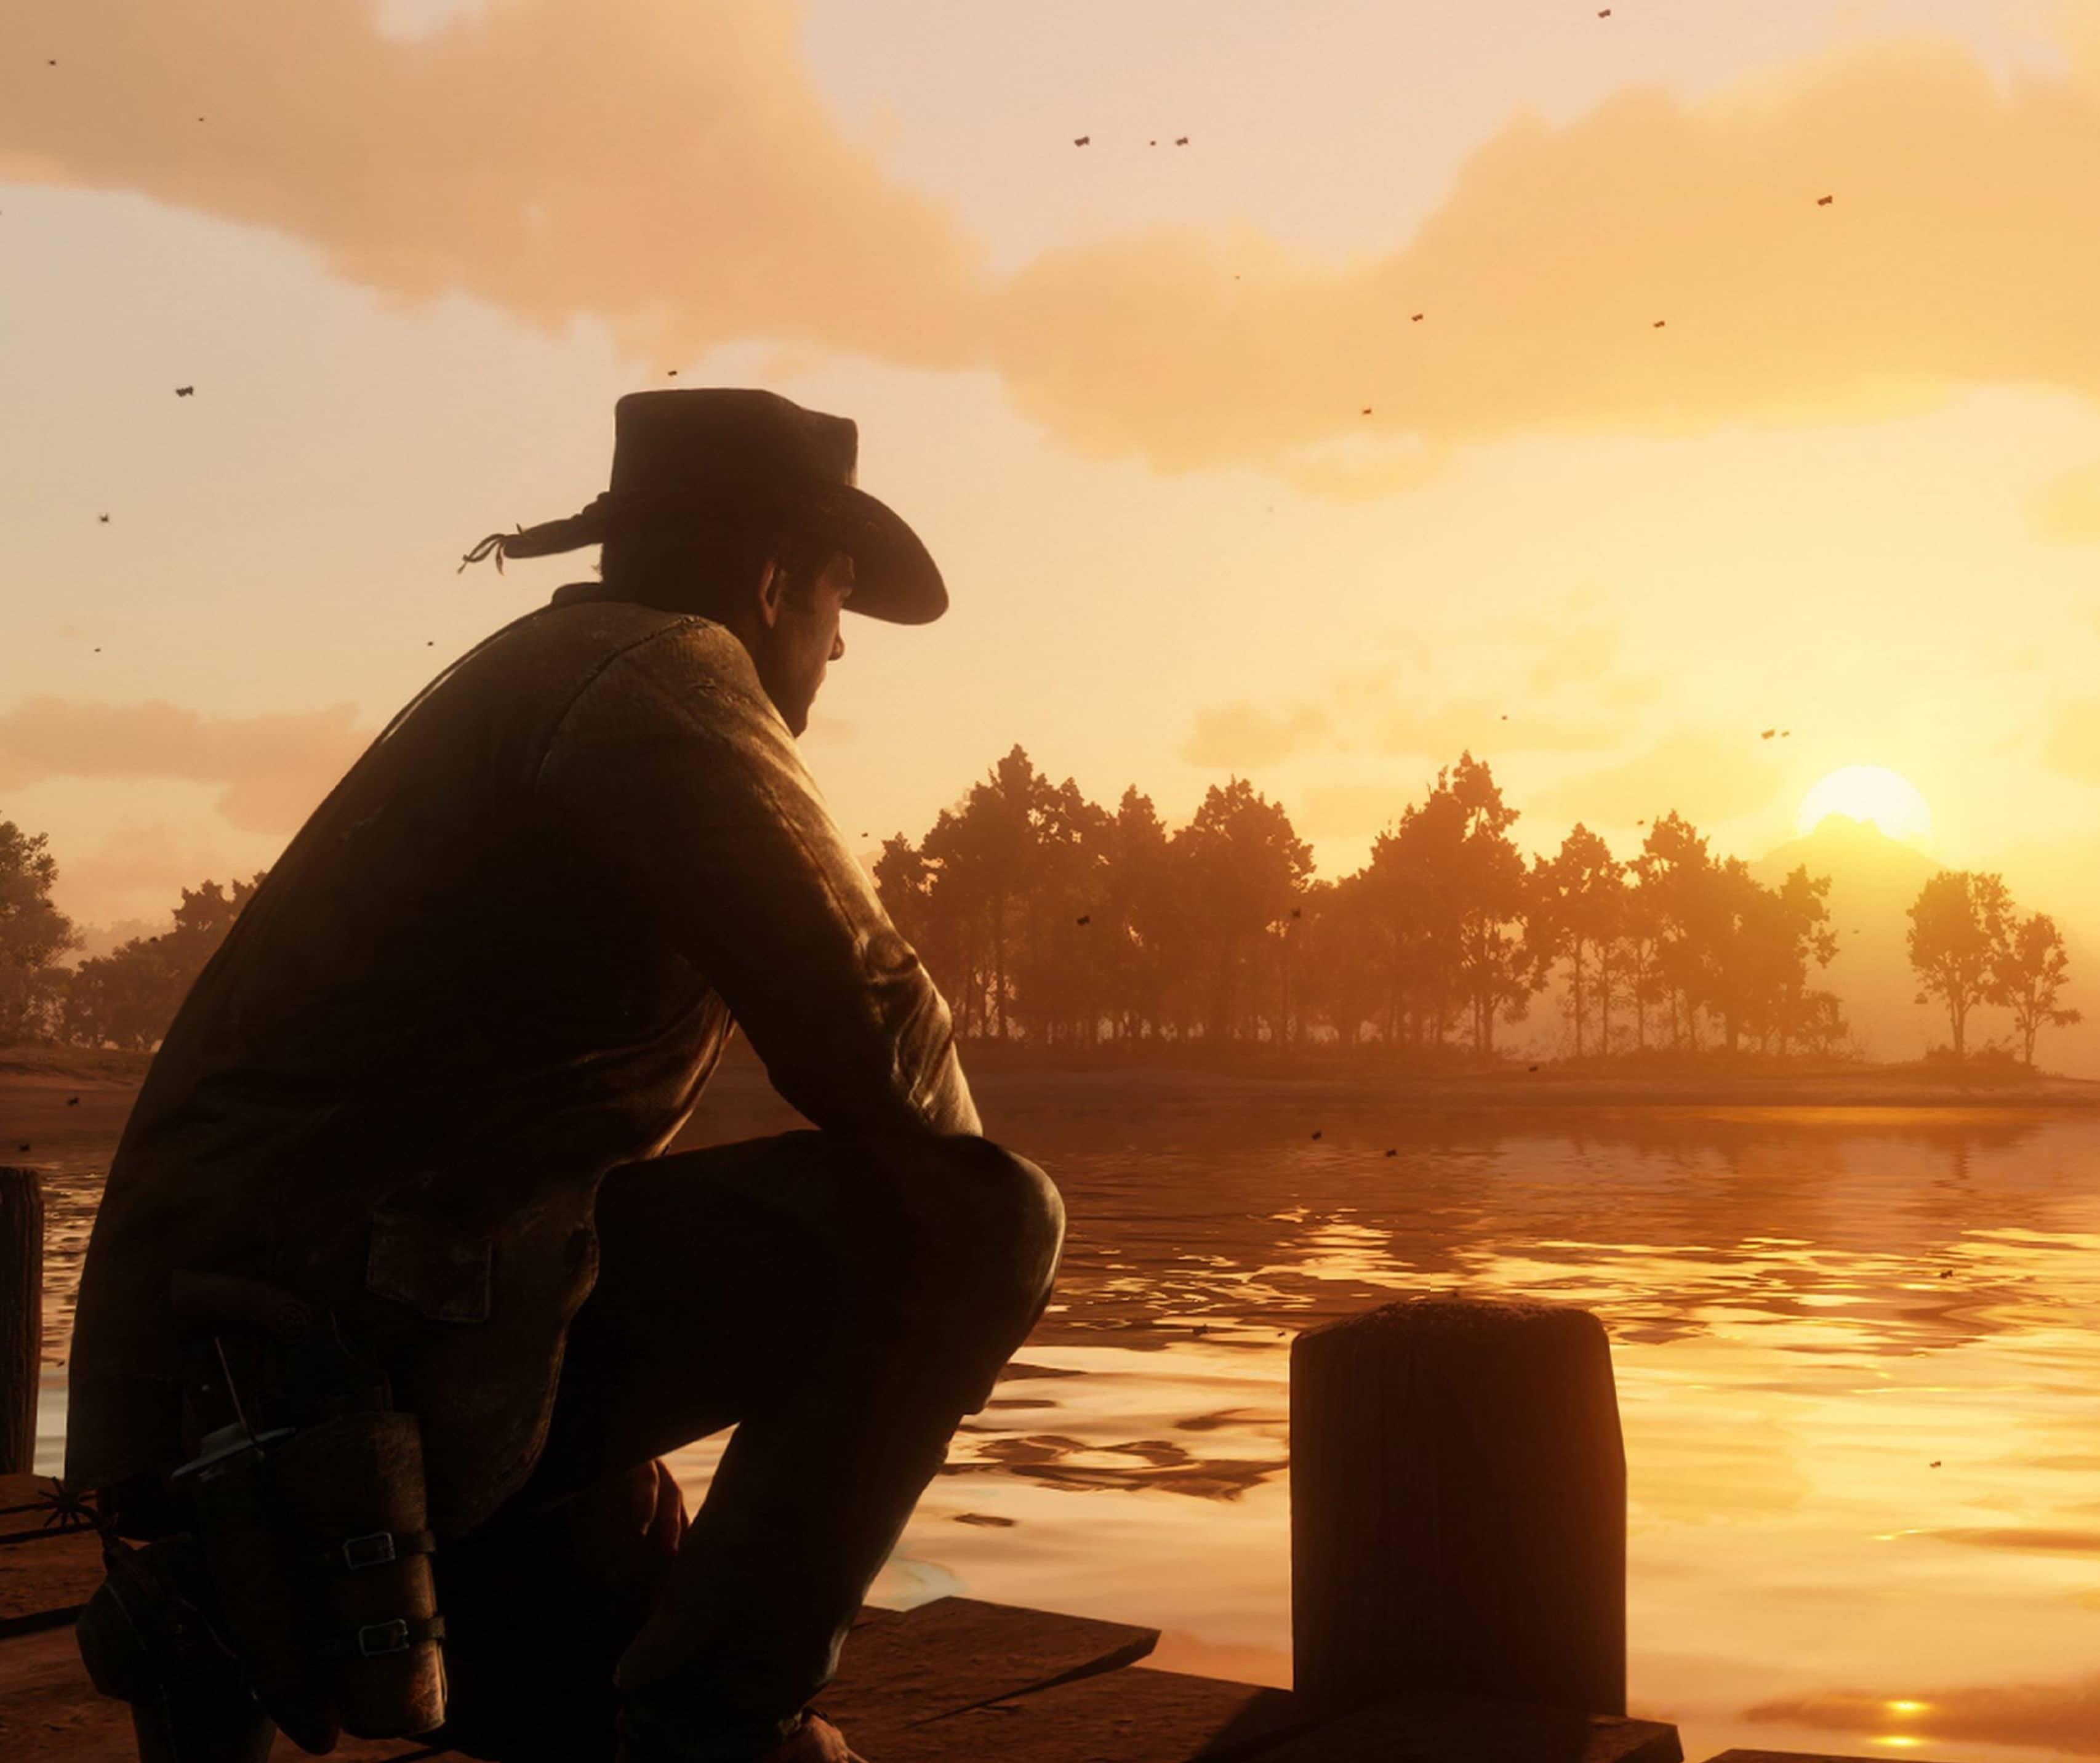 Rockstar Defends Pinkerton Name In 'Red Dead Redemption 2'